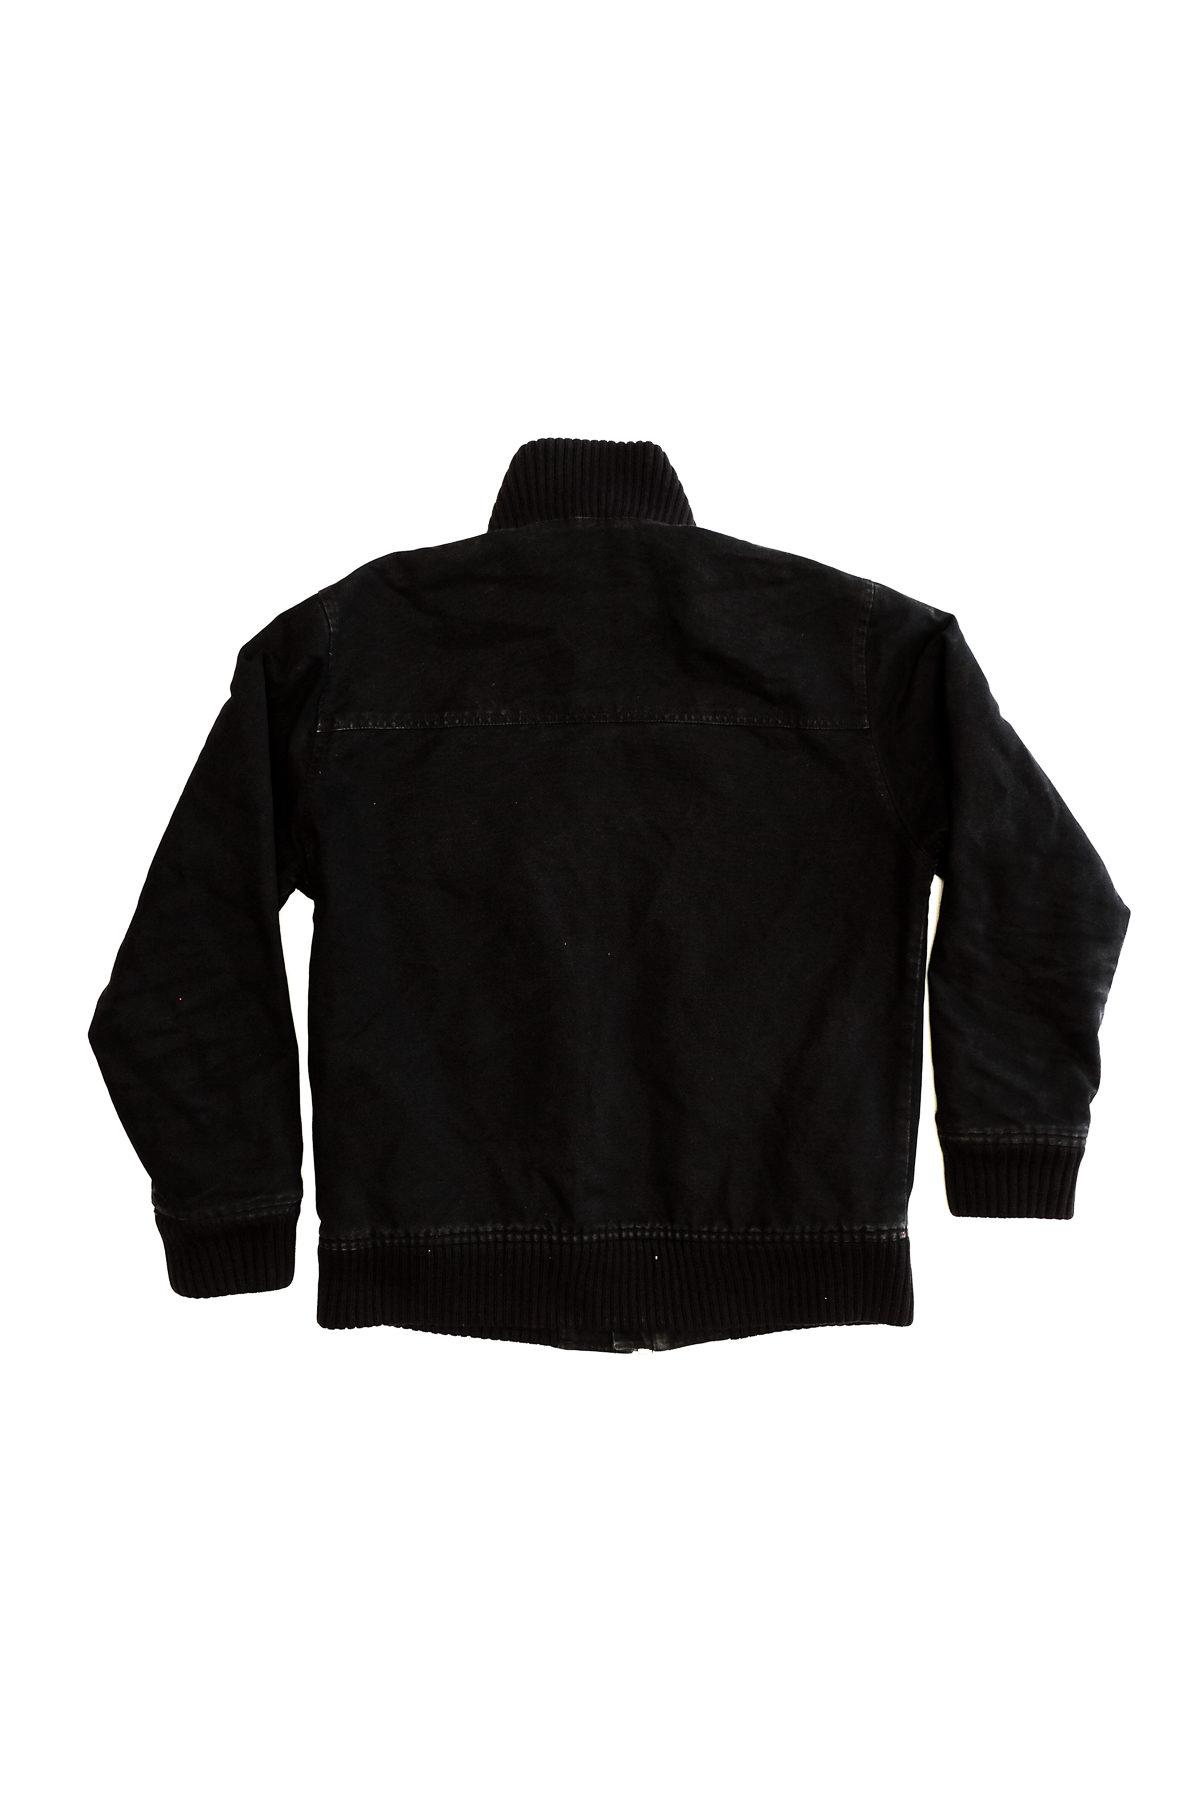 Carhartt GIUBBINO VINTAGE Black